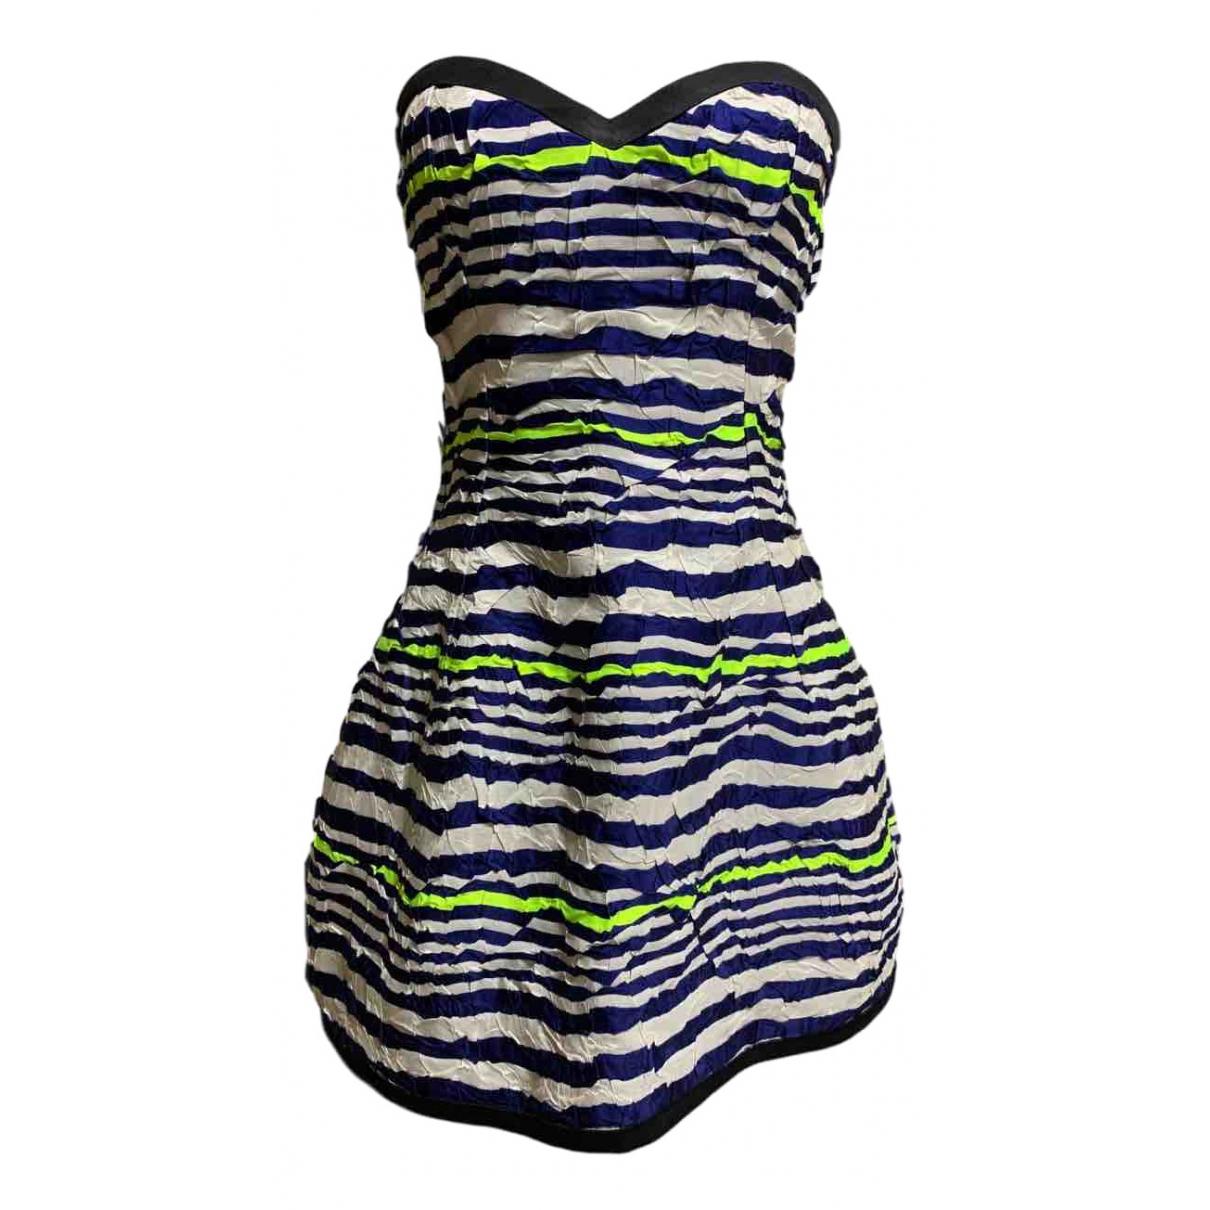 Msgm \N Multicolour dress for Women 1 US